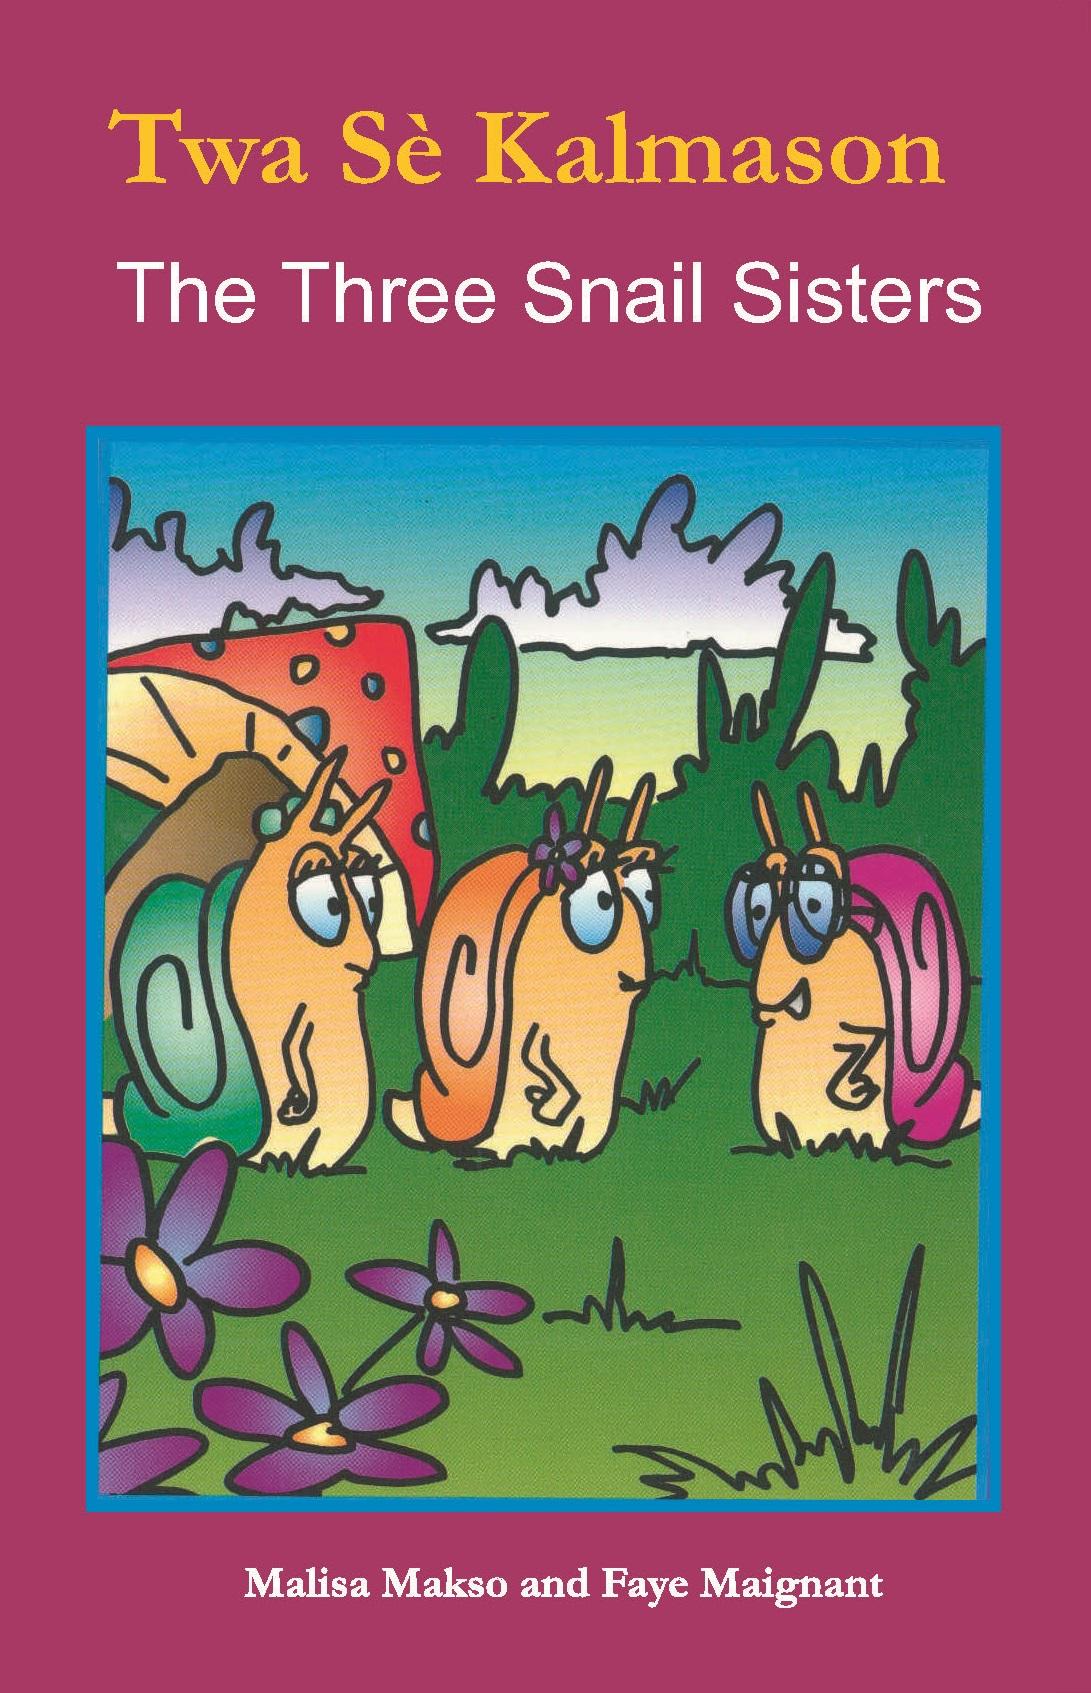 Twa Sè Kalmason / Three Snail Sisters